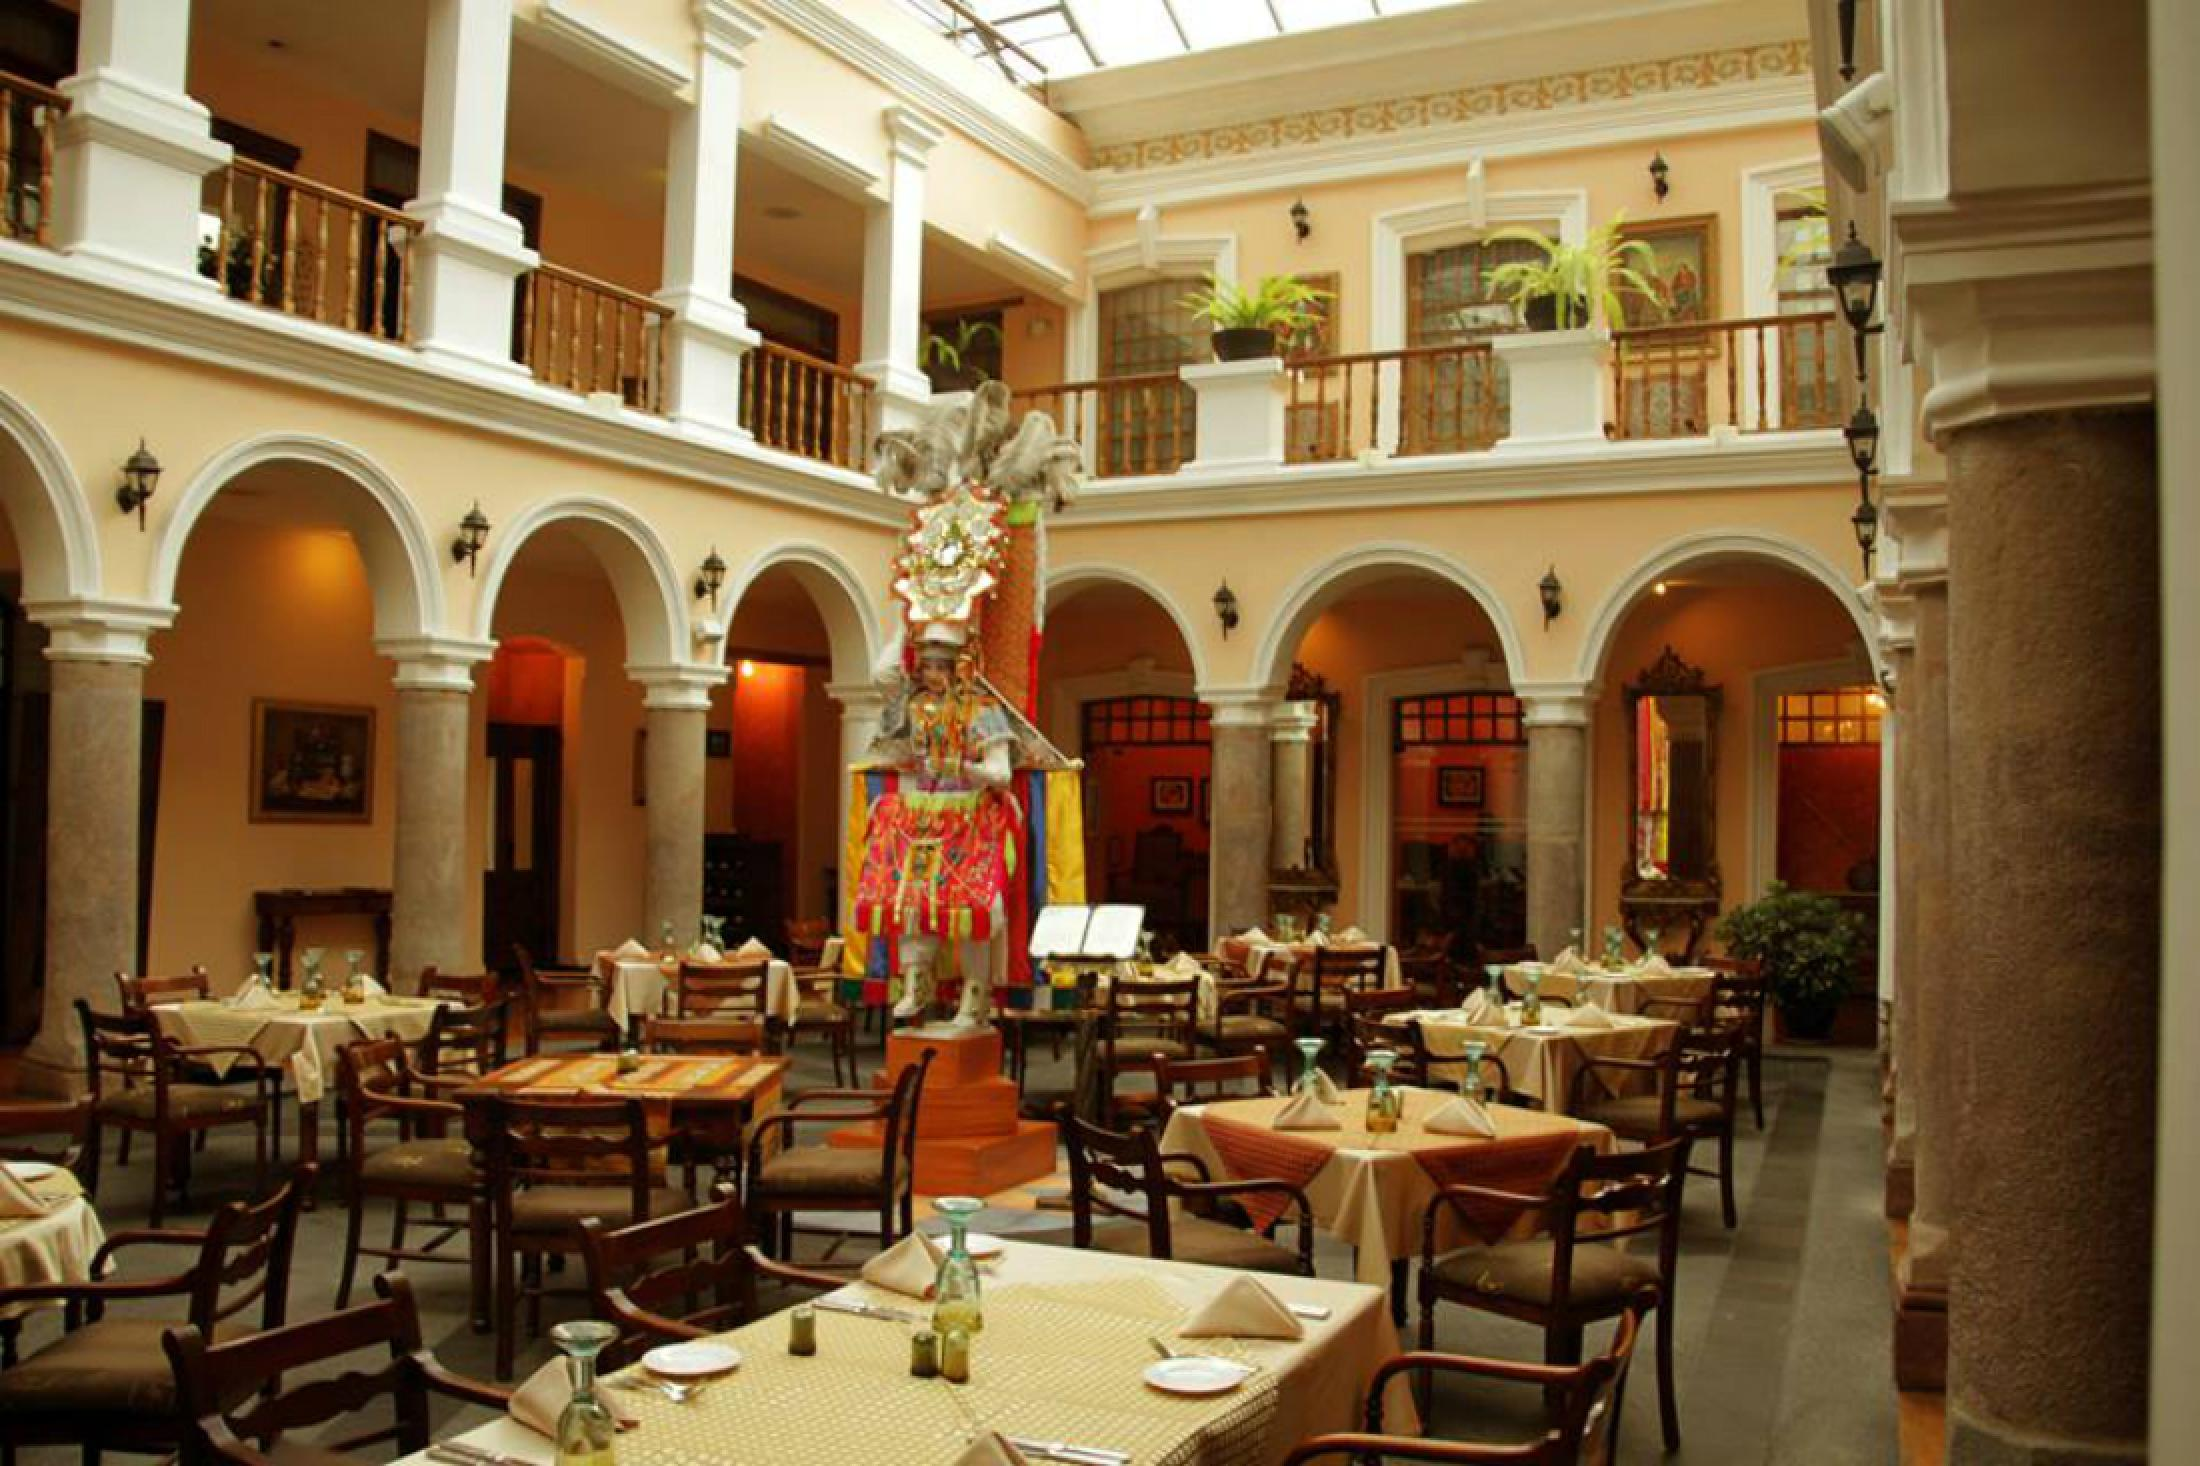 Hotel Patio Andaluz ... - Hotel Patio Andaluz - Quito, Ecuador